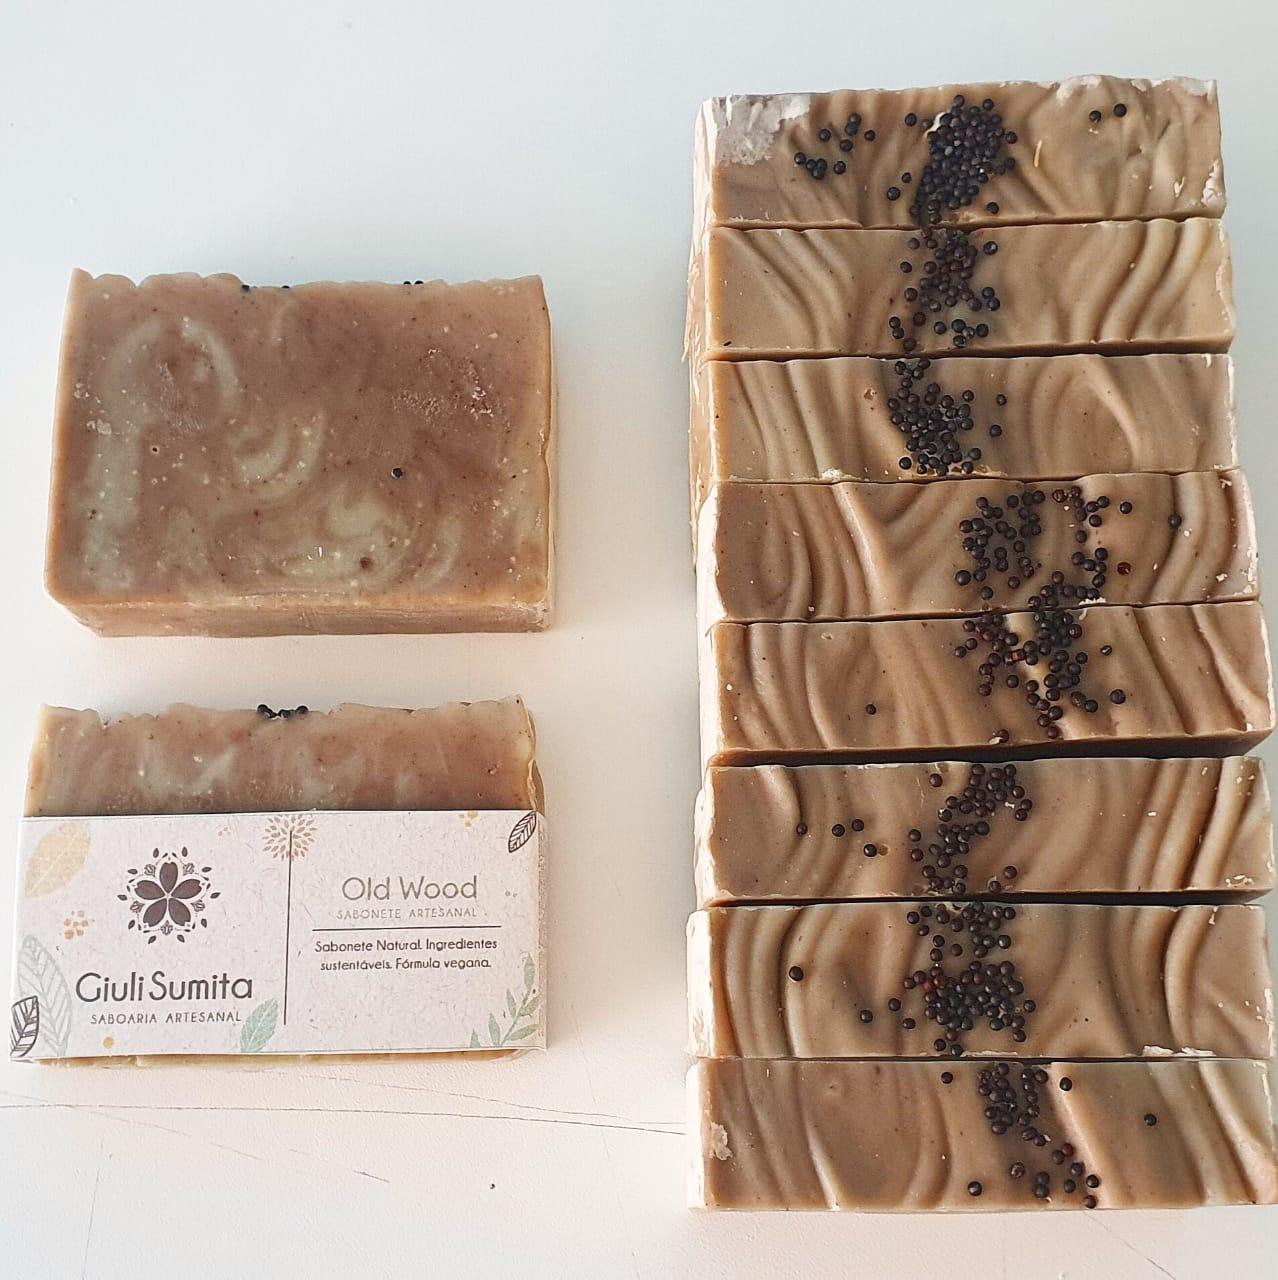 Old Wood - Sabonete